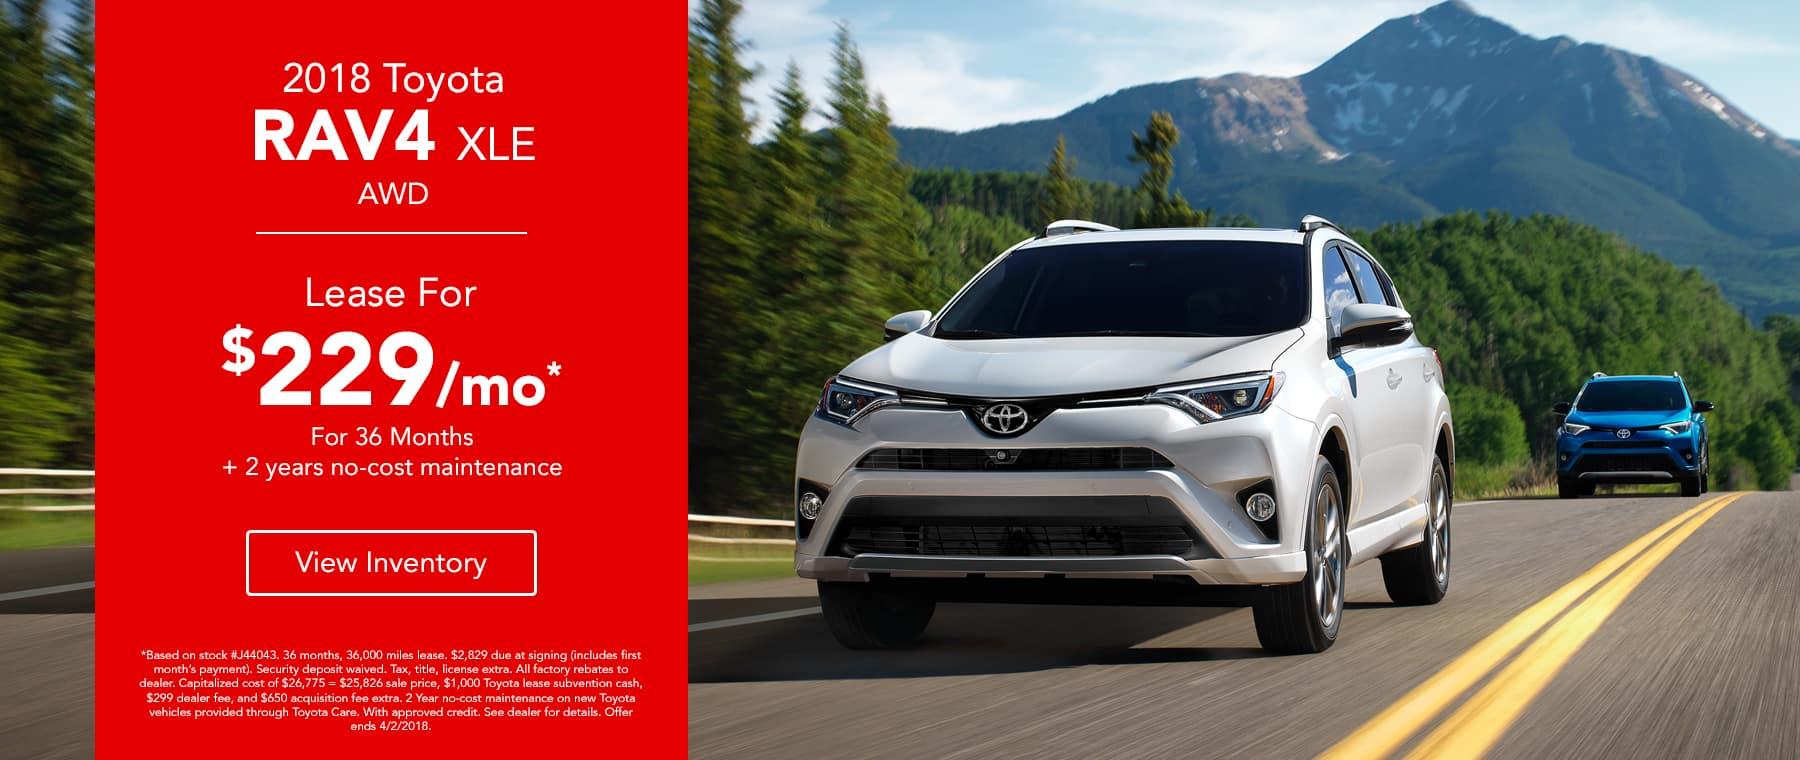 Toyota RAV4 XLE AWD - Lease for $229/mo